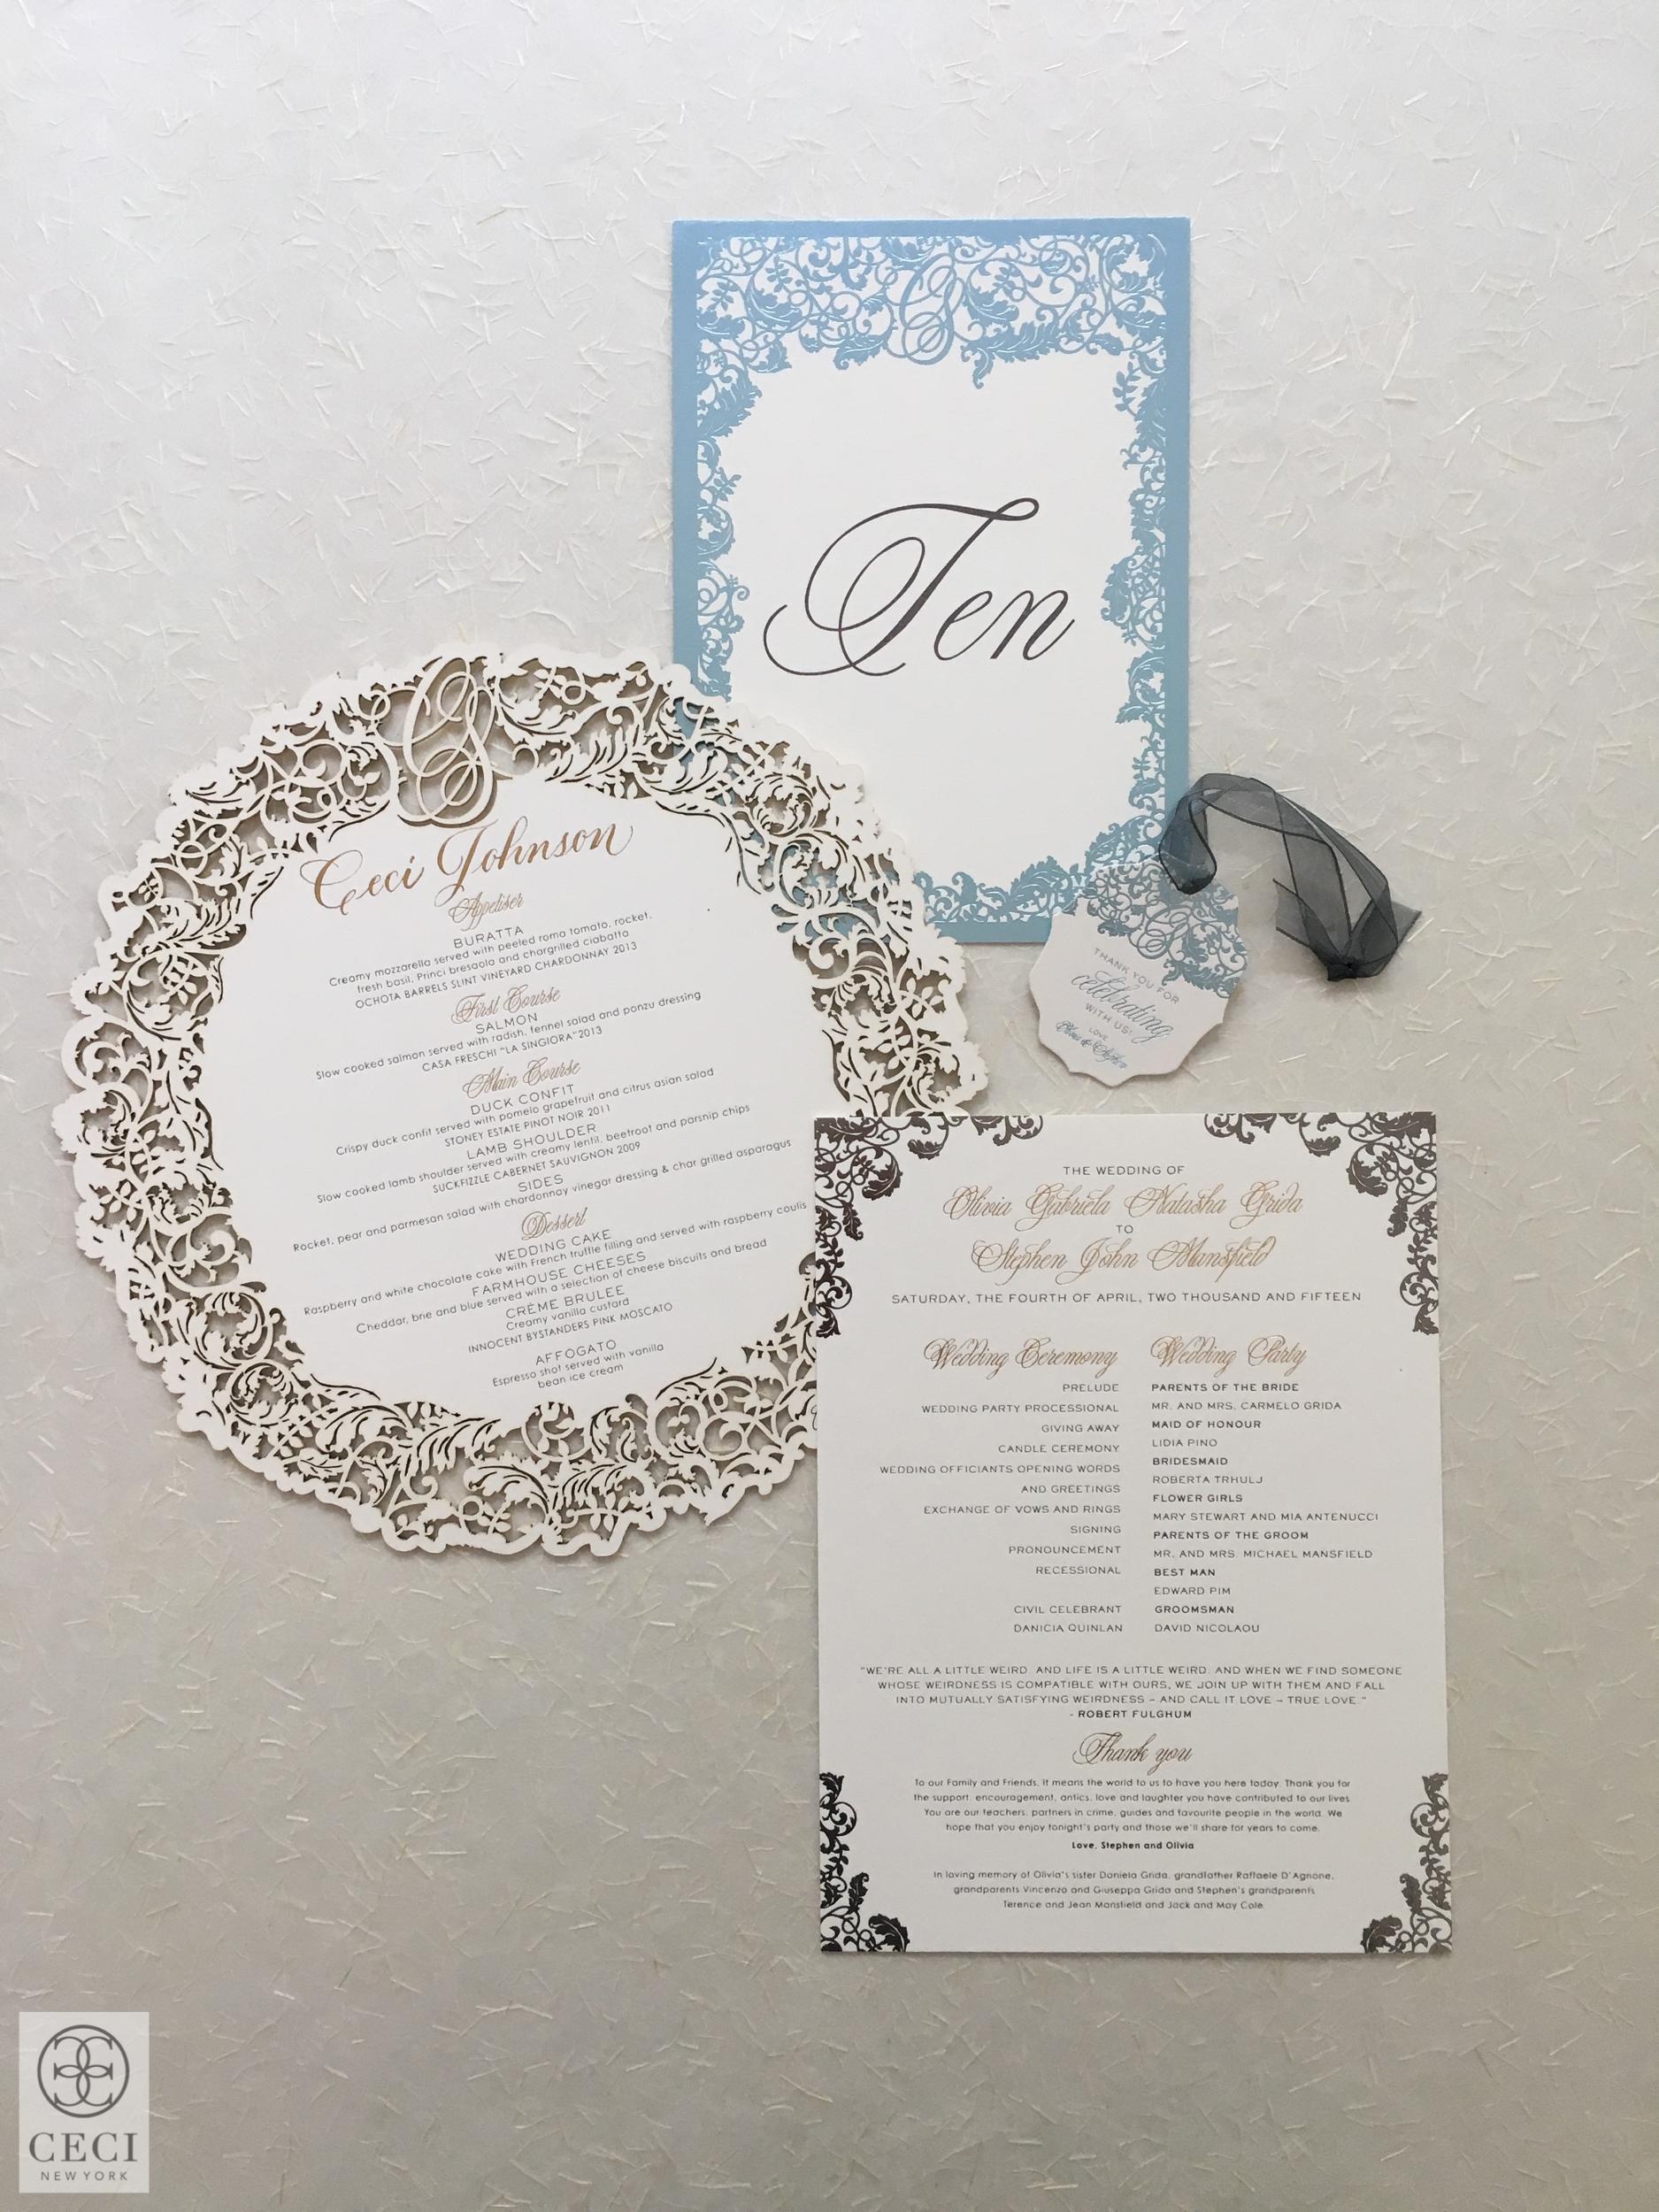 v2Ceci_New_York_Custom_Luxury_Wedding_BeautyShot_LaserCut_Stationery_Personalized_Couture_Foil_Stamping_Perth_Destination_Australia_Chic_-2.jpg